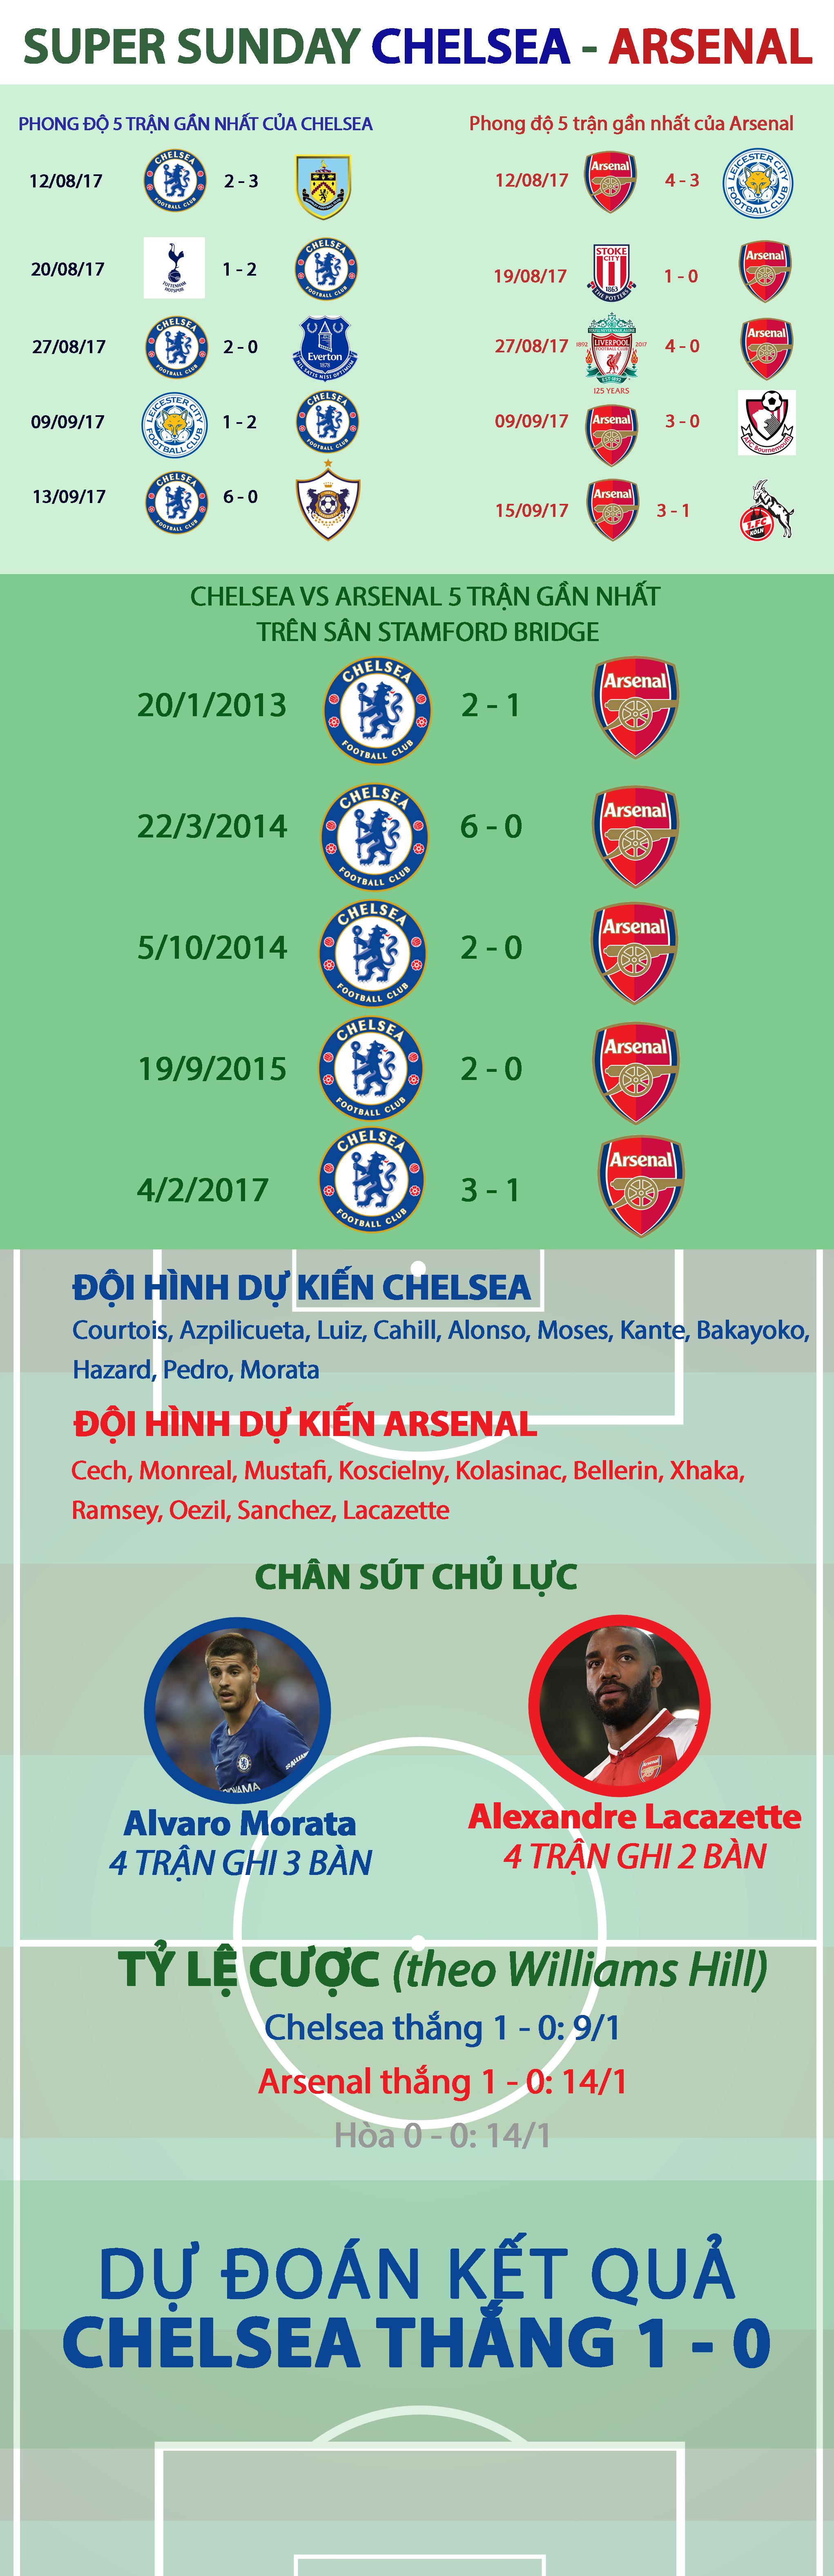 Chelsea lại gieo sầu cho Arsenal? - Ảnh 1.